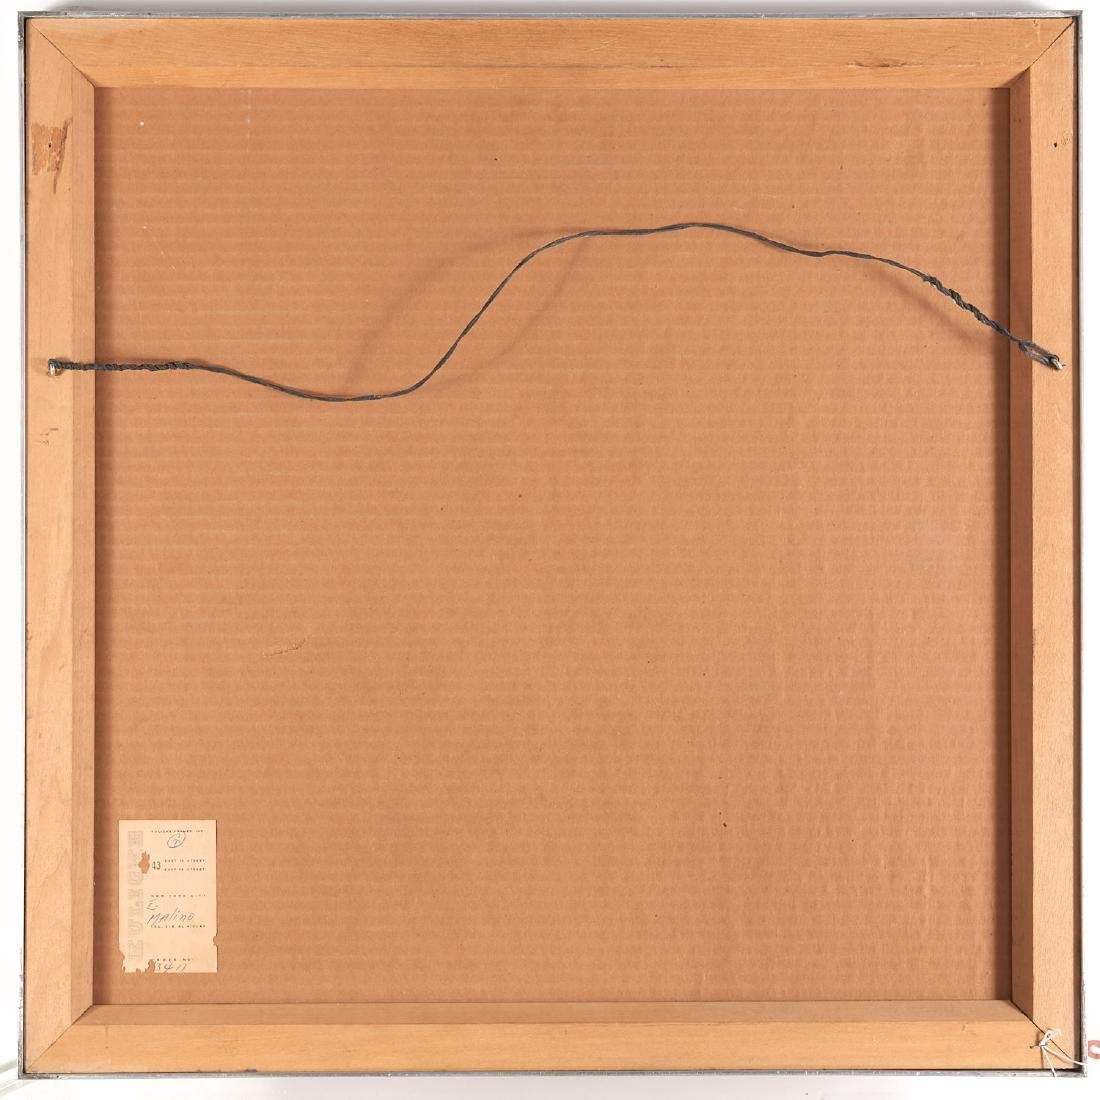 Andy Warhol, print - 6